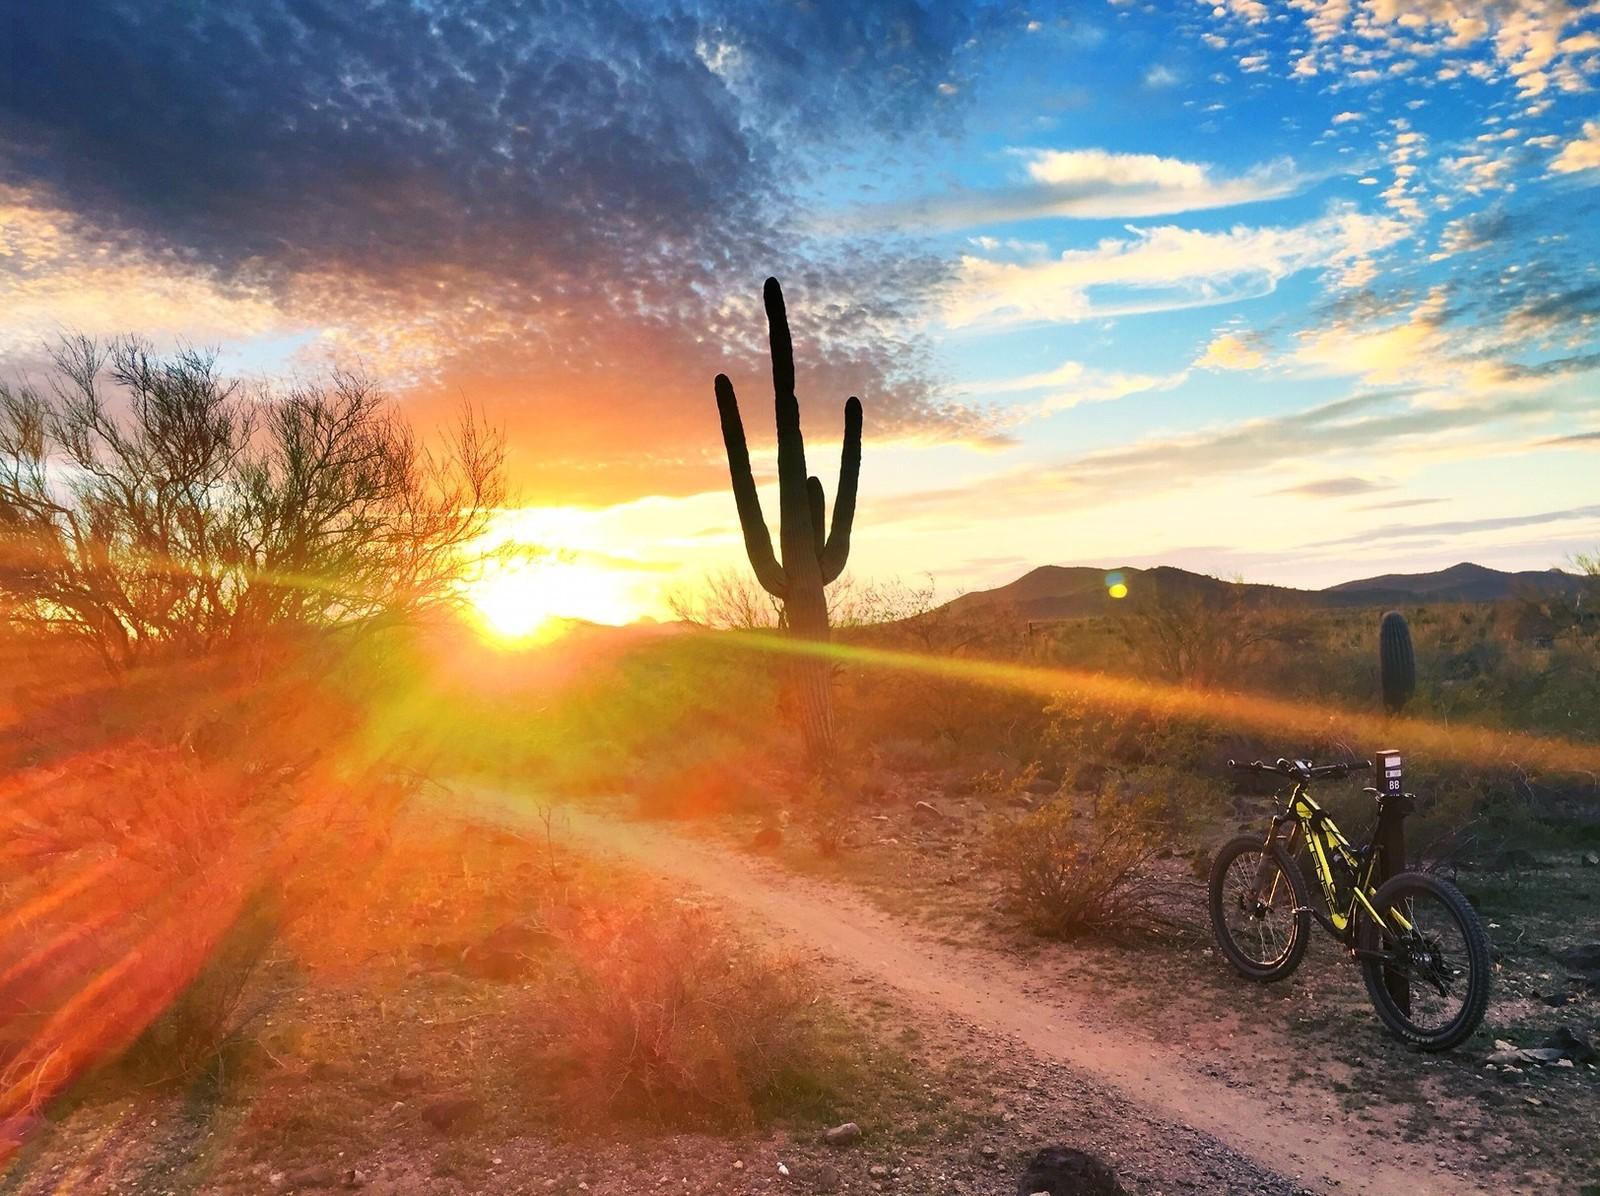 Carbine at sunset - azmtbr - Mountain Biking Pictures - Vital MTB